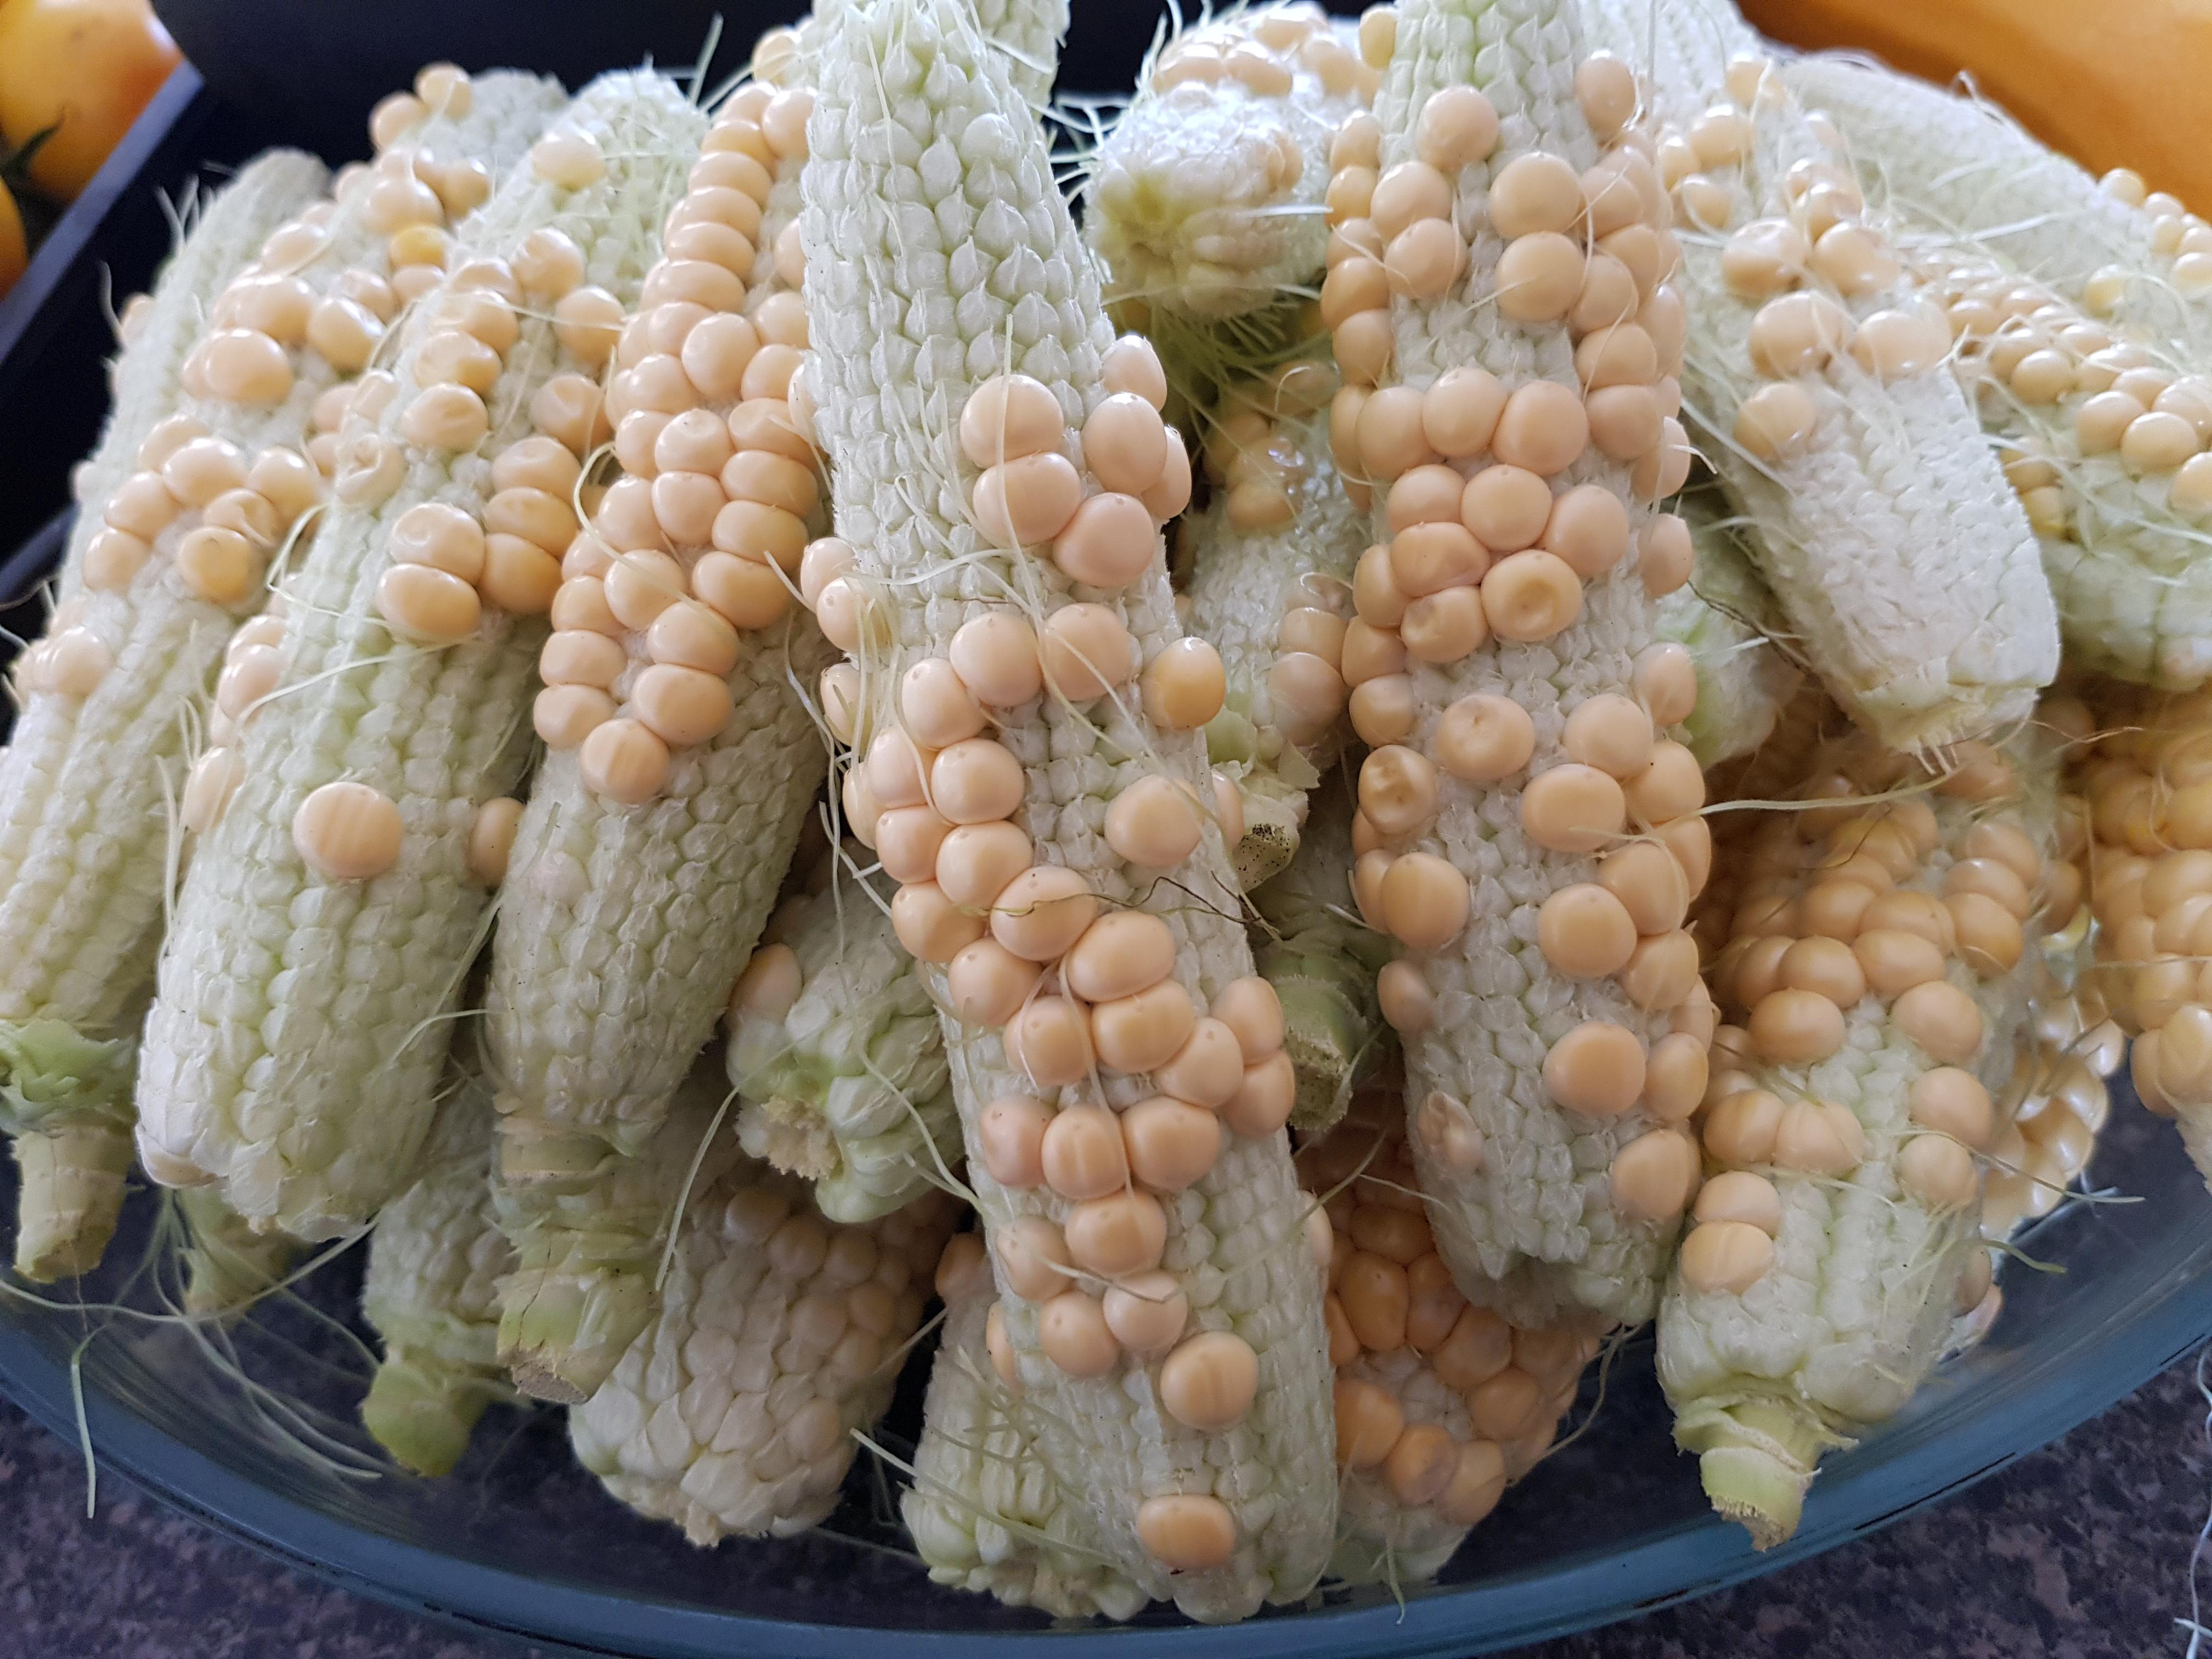 Poor corn pollination